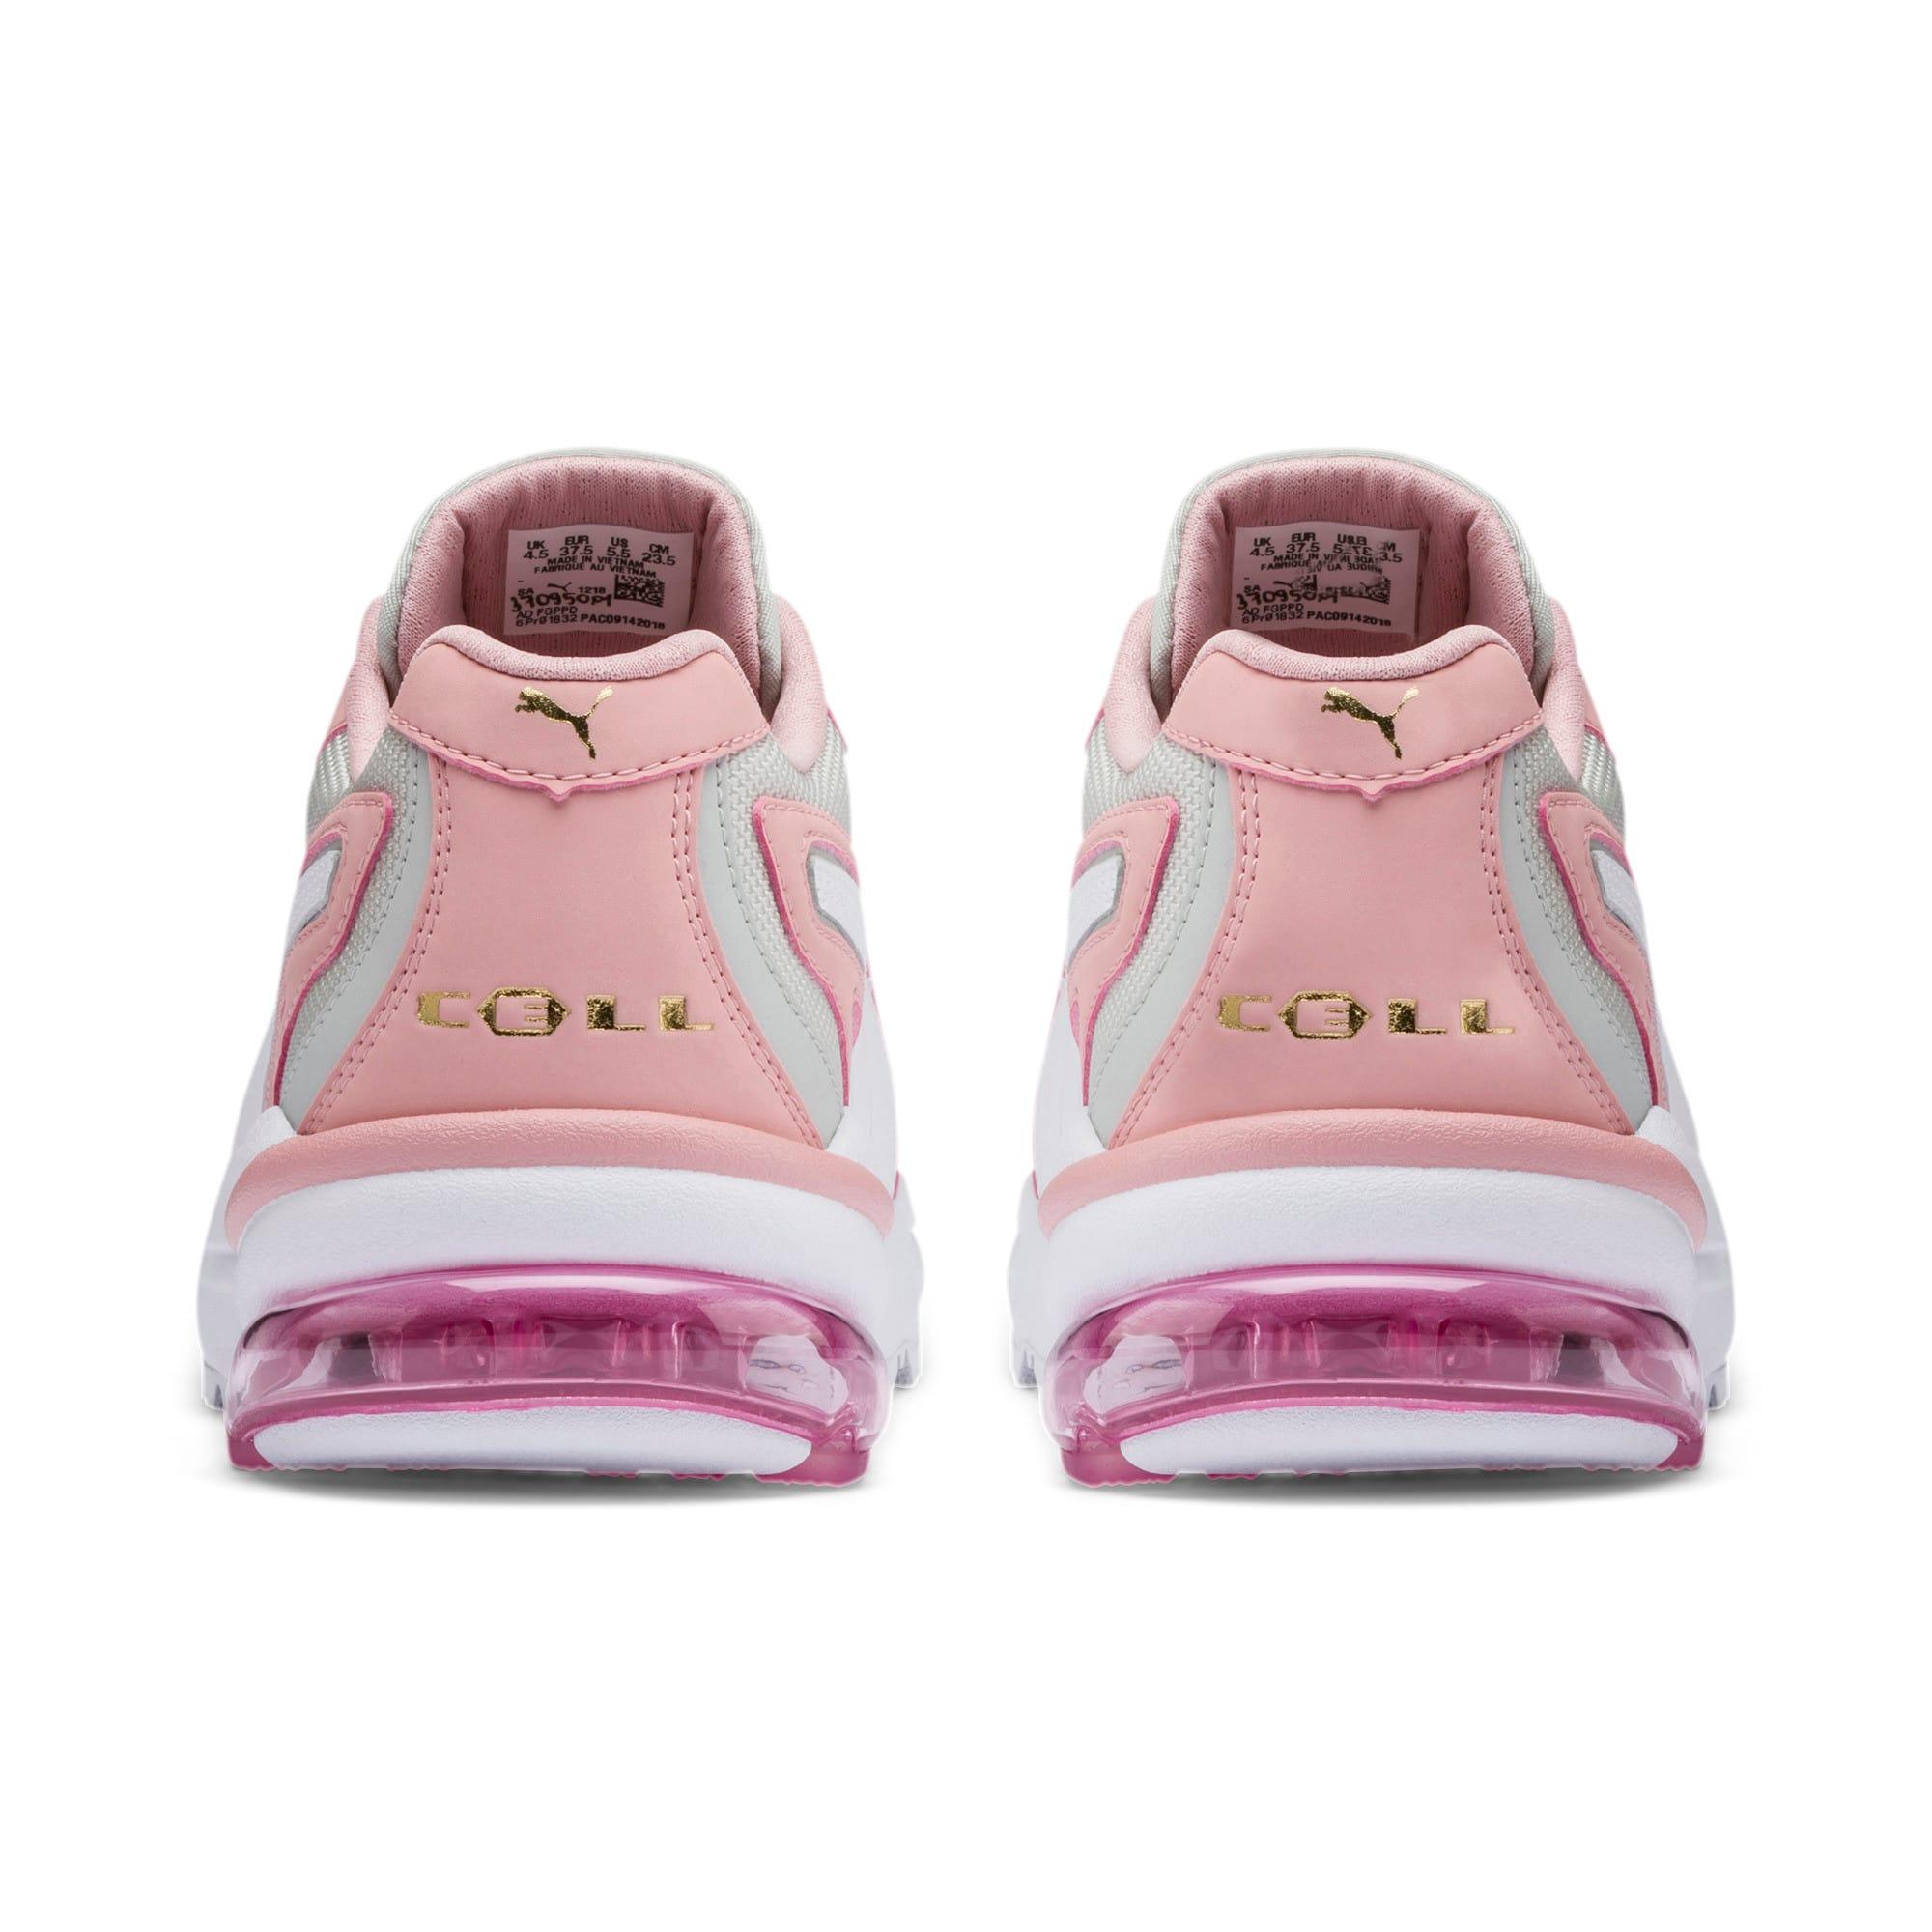 Miniatura 4 de Zapatos deportivos CELL Stellar para mujer, Bridal Rose-Gray Violet, mediano